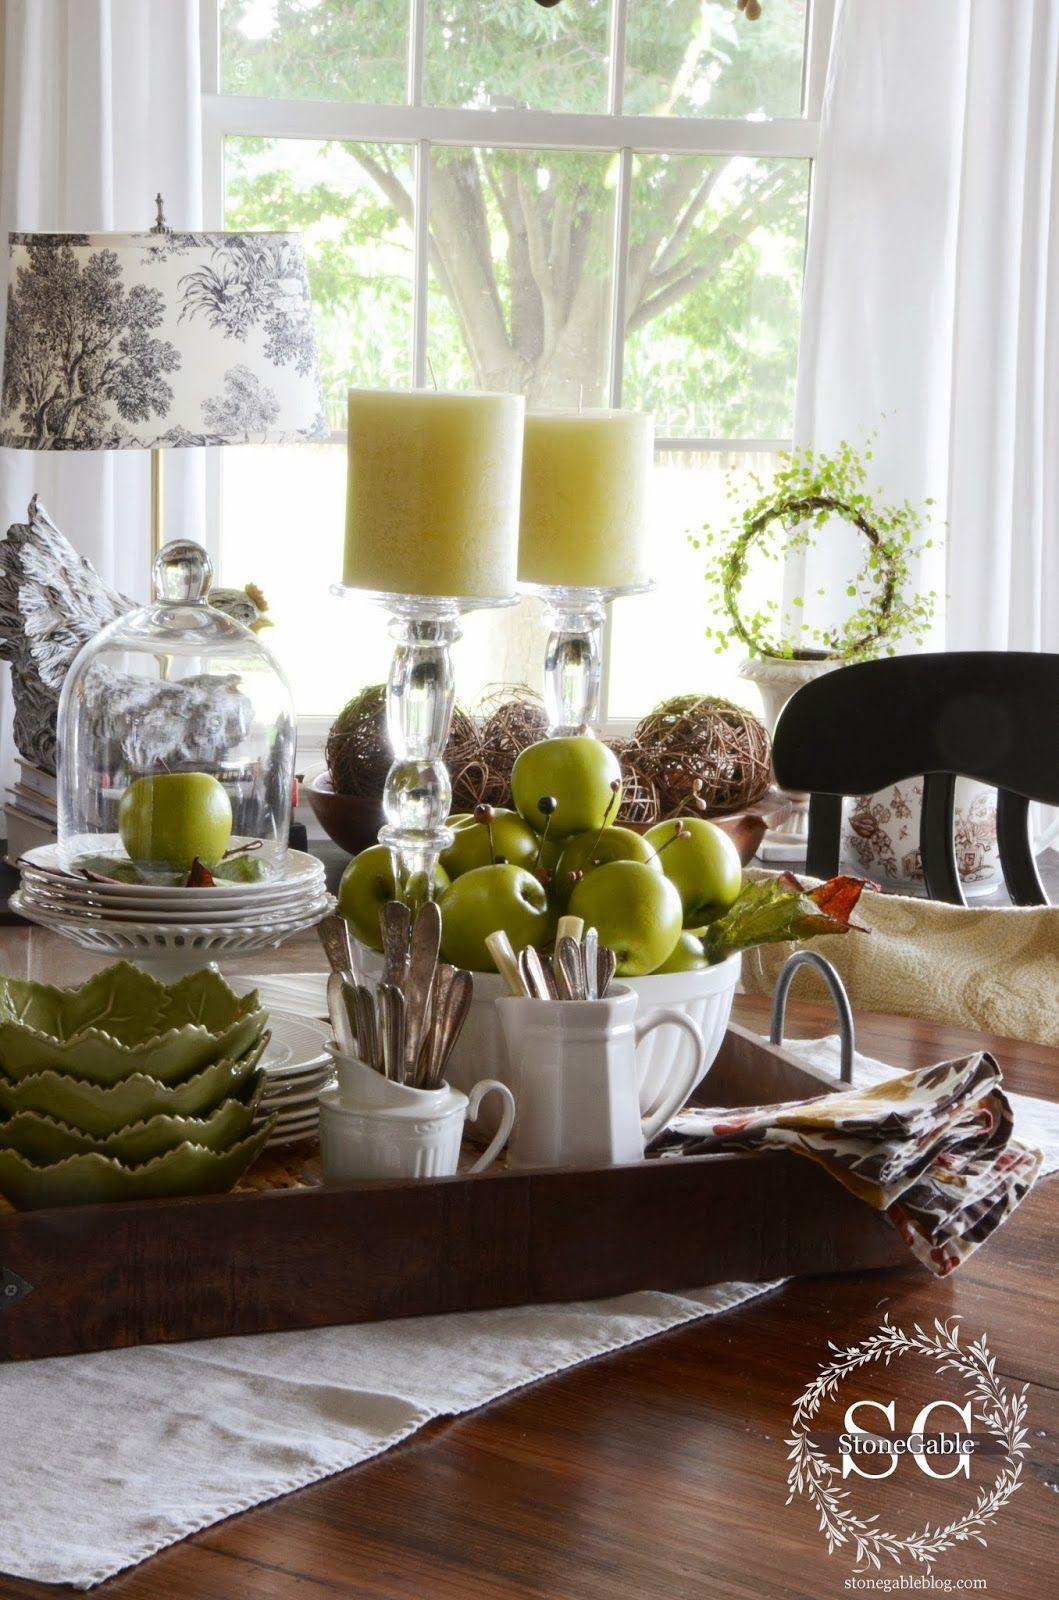 6 tips for creating a kitchen table vignette spring decorating rh pinterest com